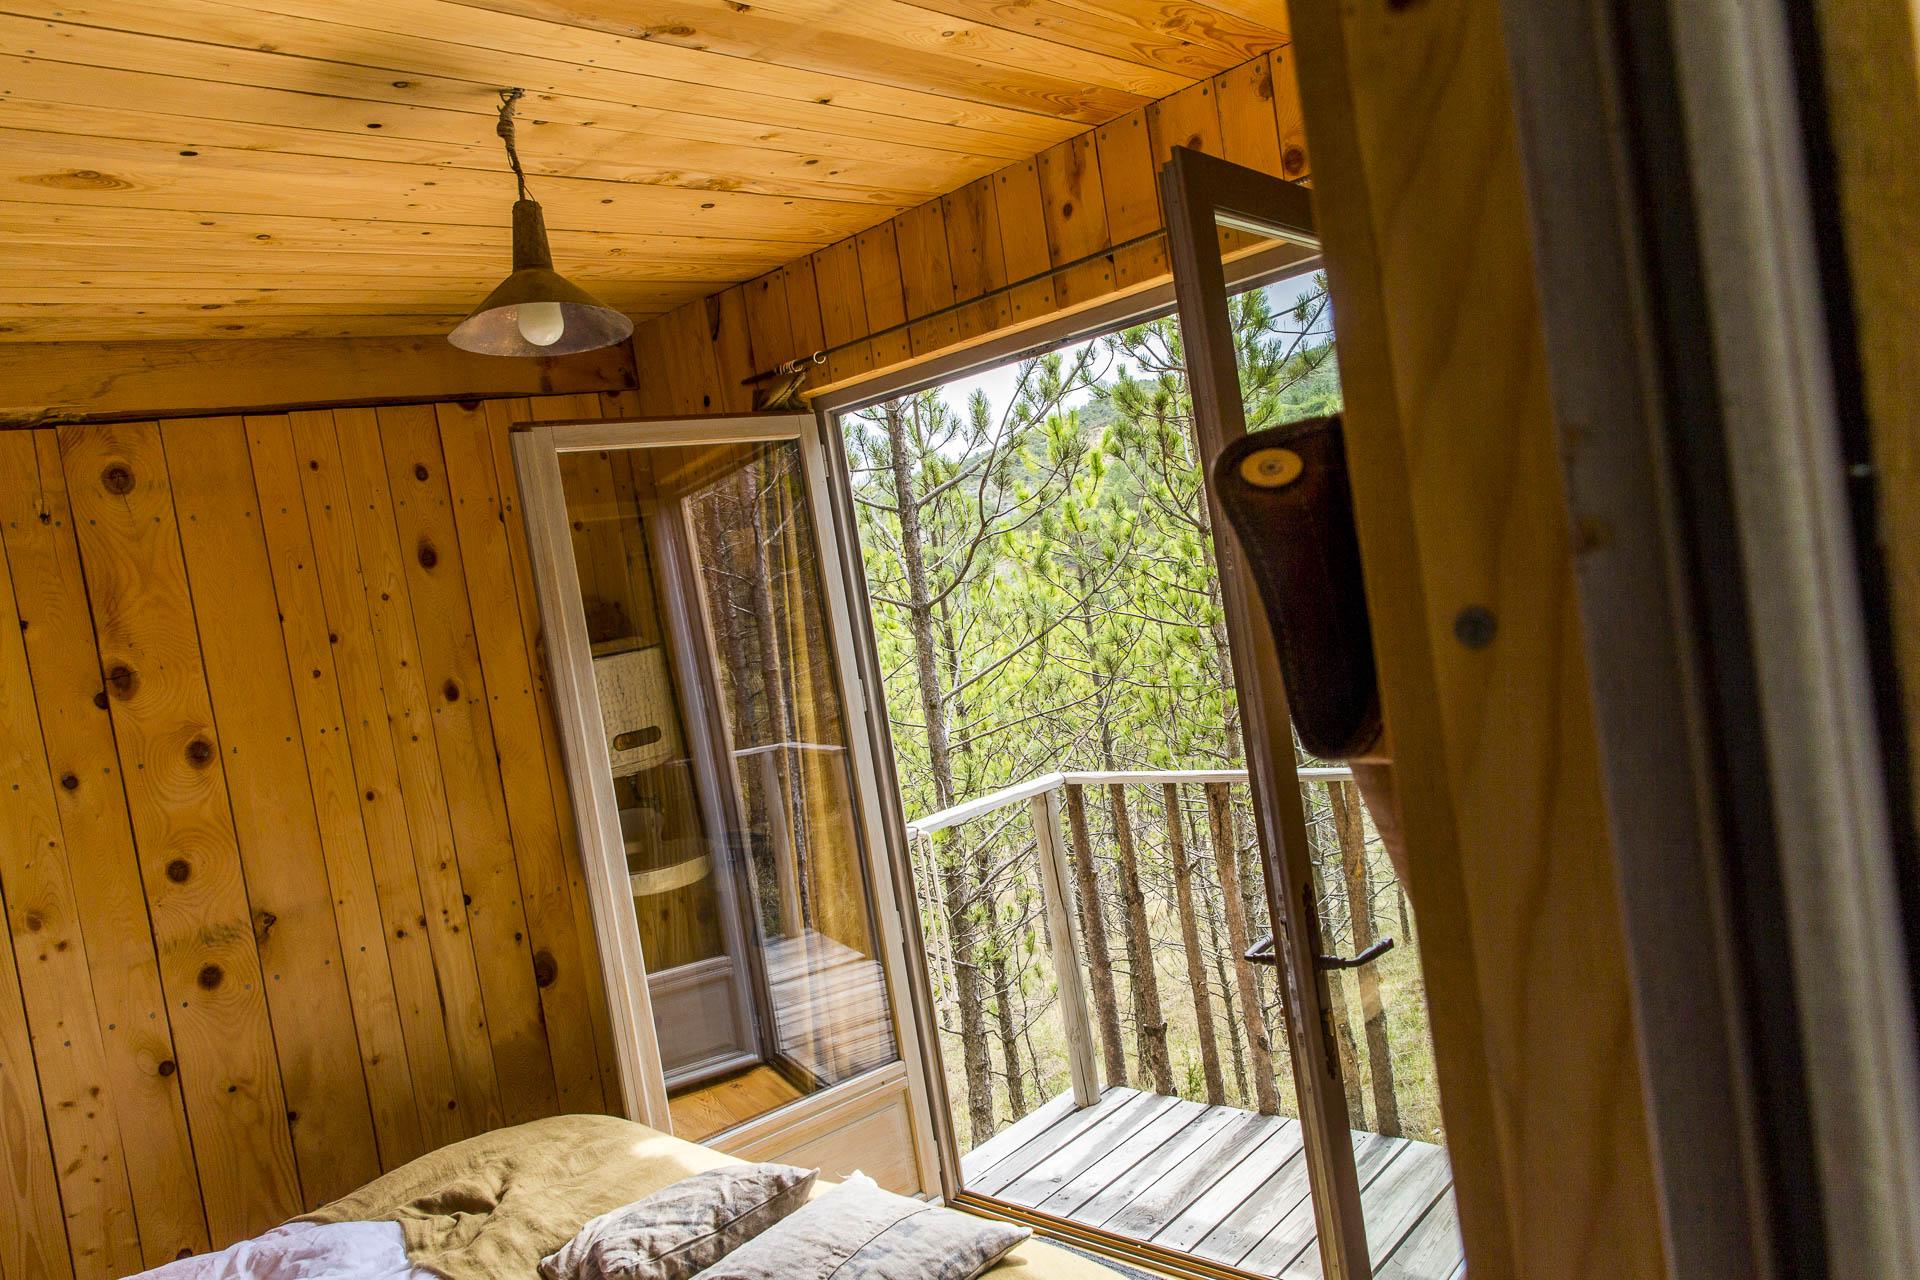 Hébergements en cabane